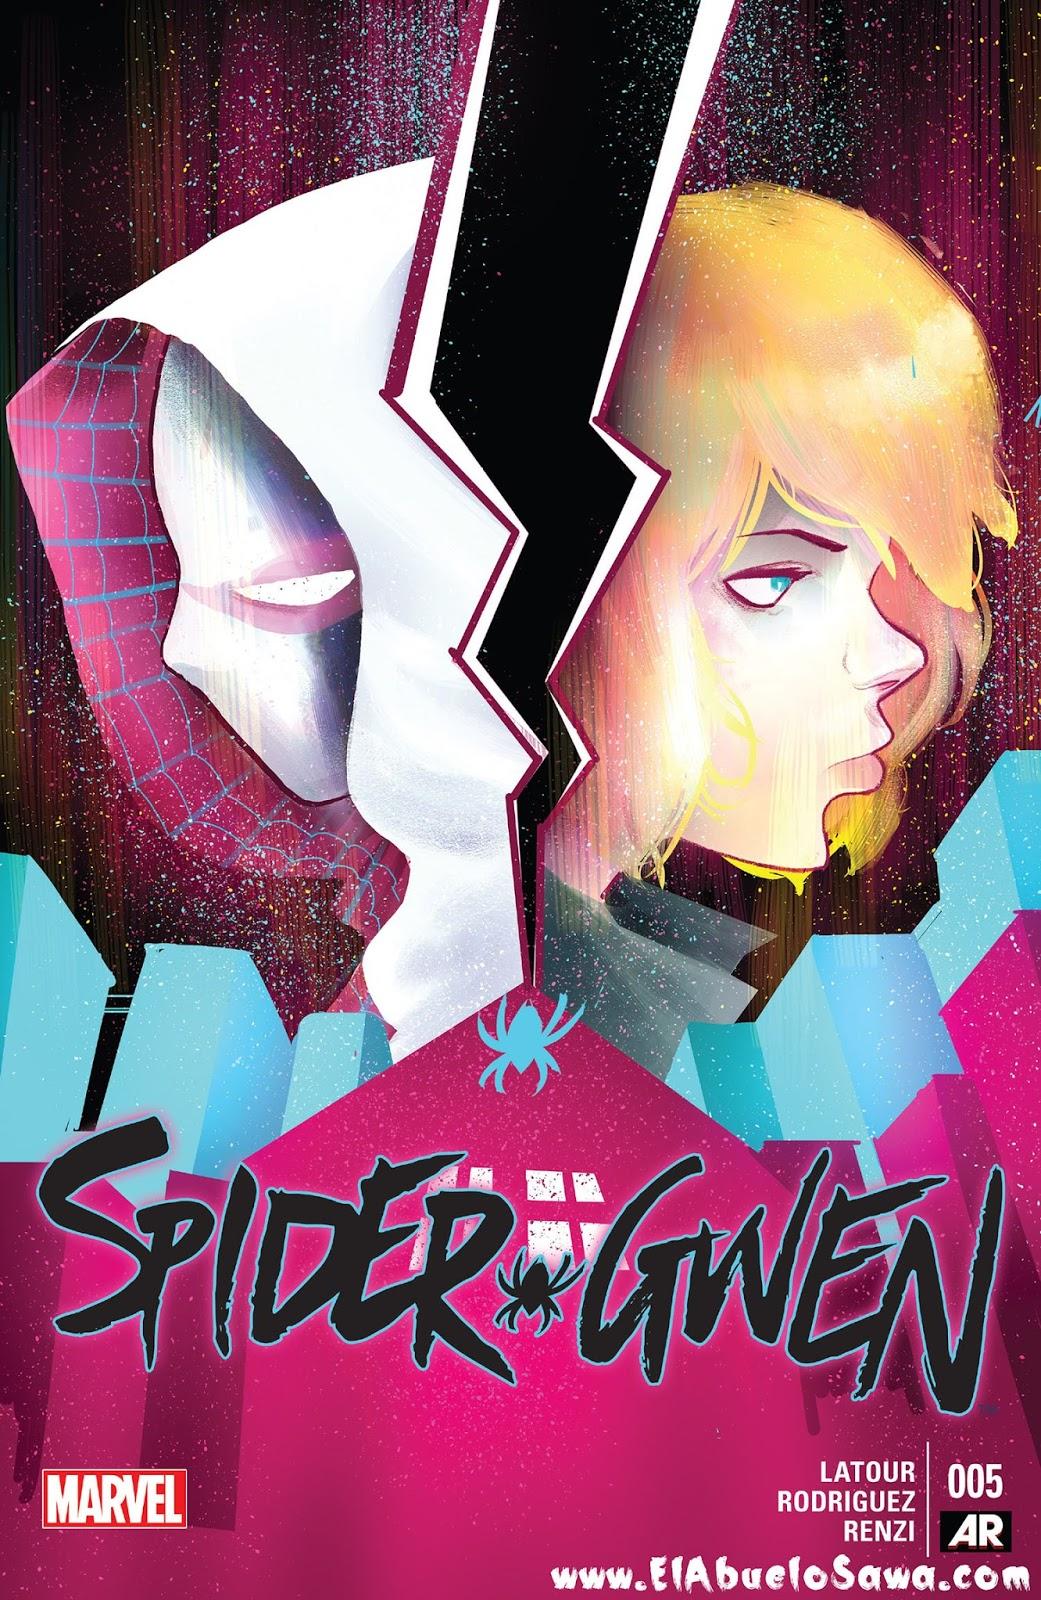 Leer Spider Gwen Volumen 1 y 2 Online en Español